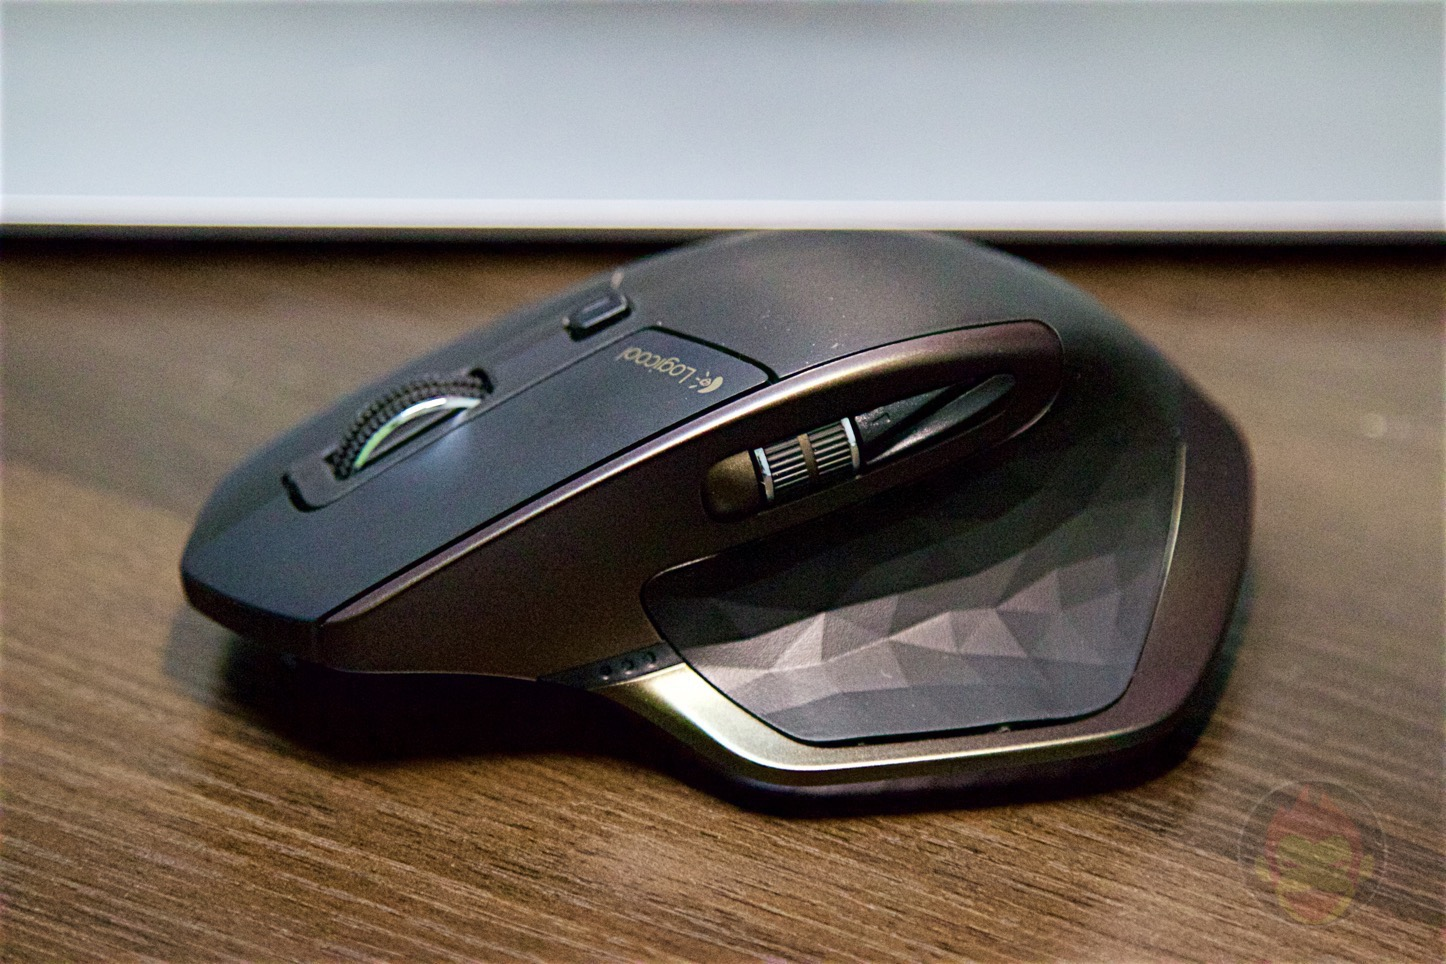 Logicool MX Master Mouse